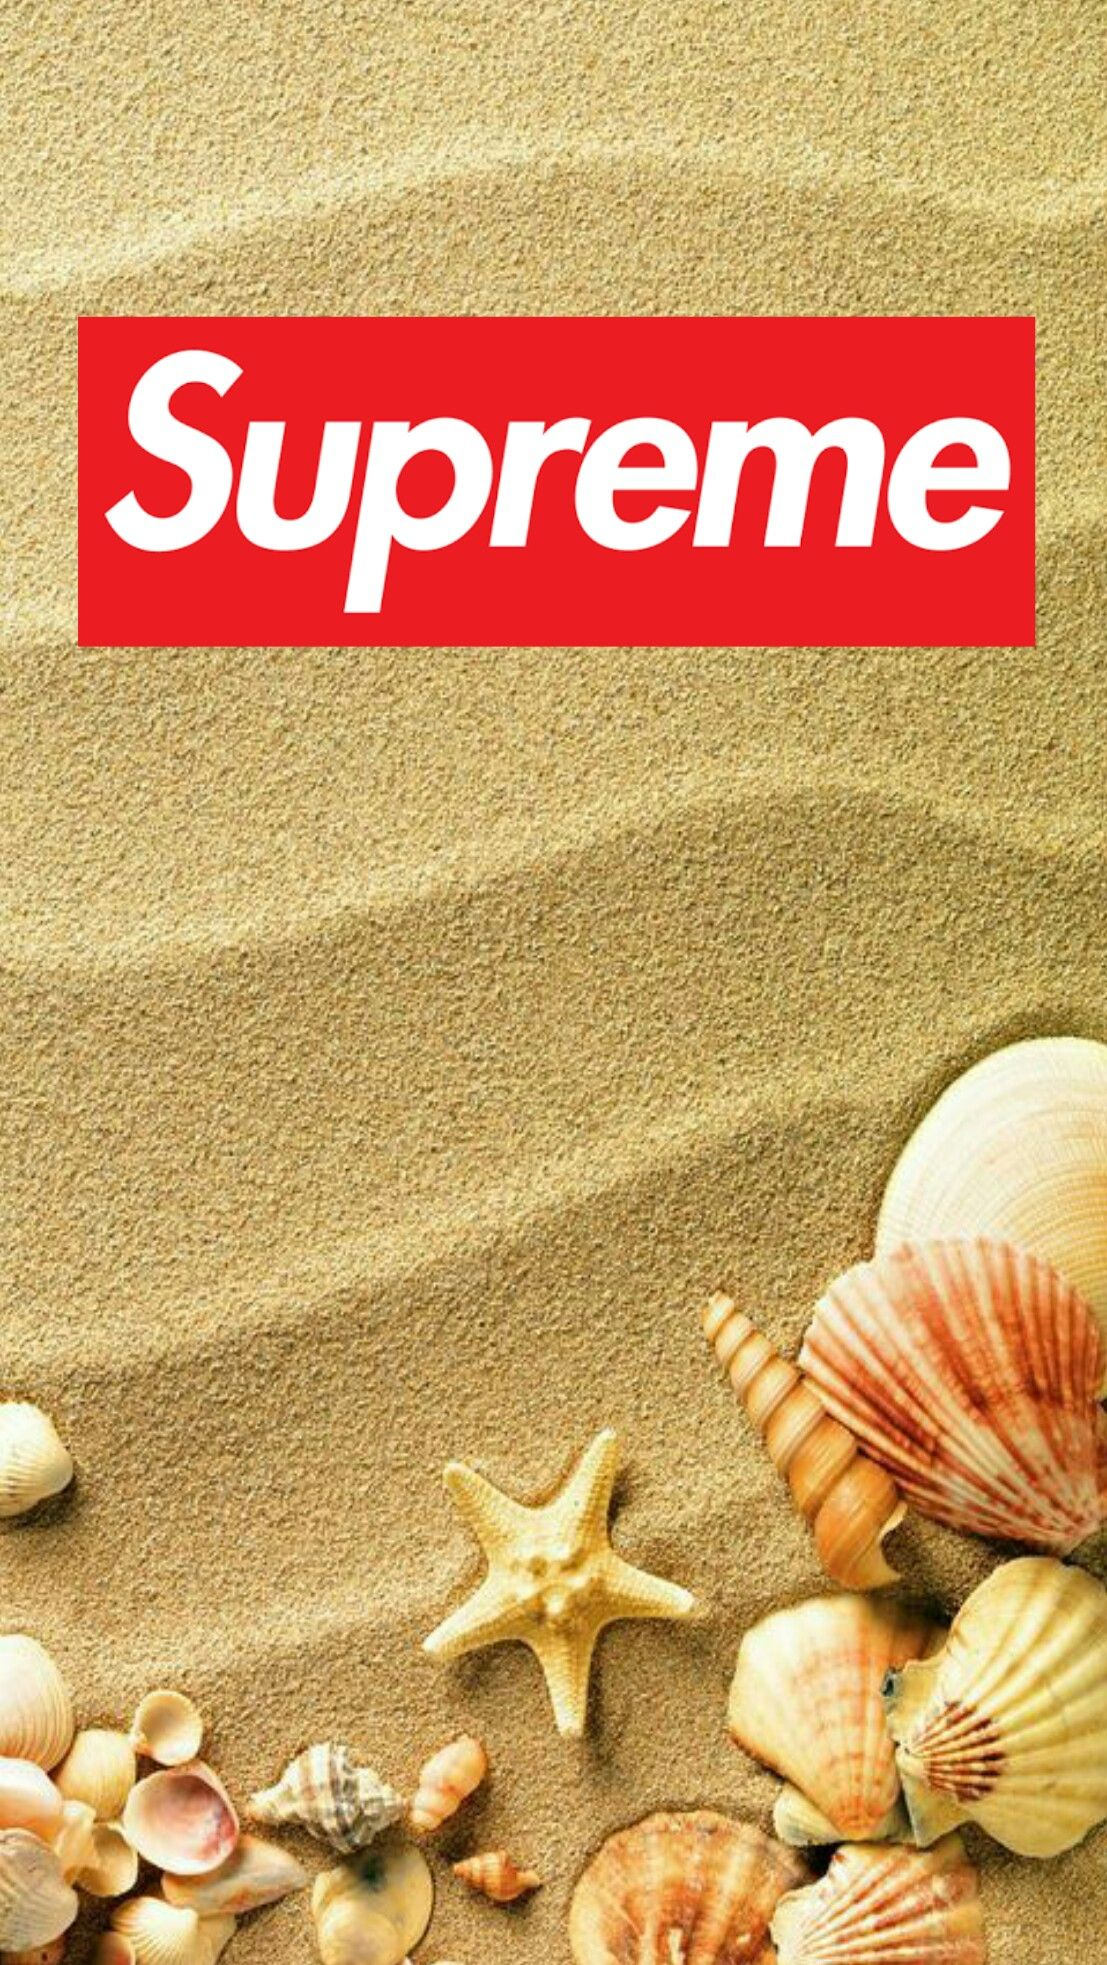 Supreme // Fond d'ecran // Iphone Wallpaper // Tendance // Logo // Fashion // clothing // Life ...